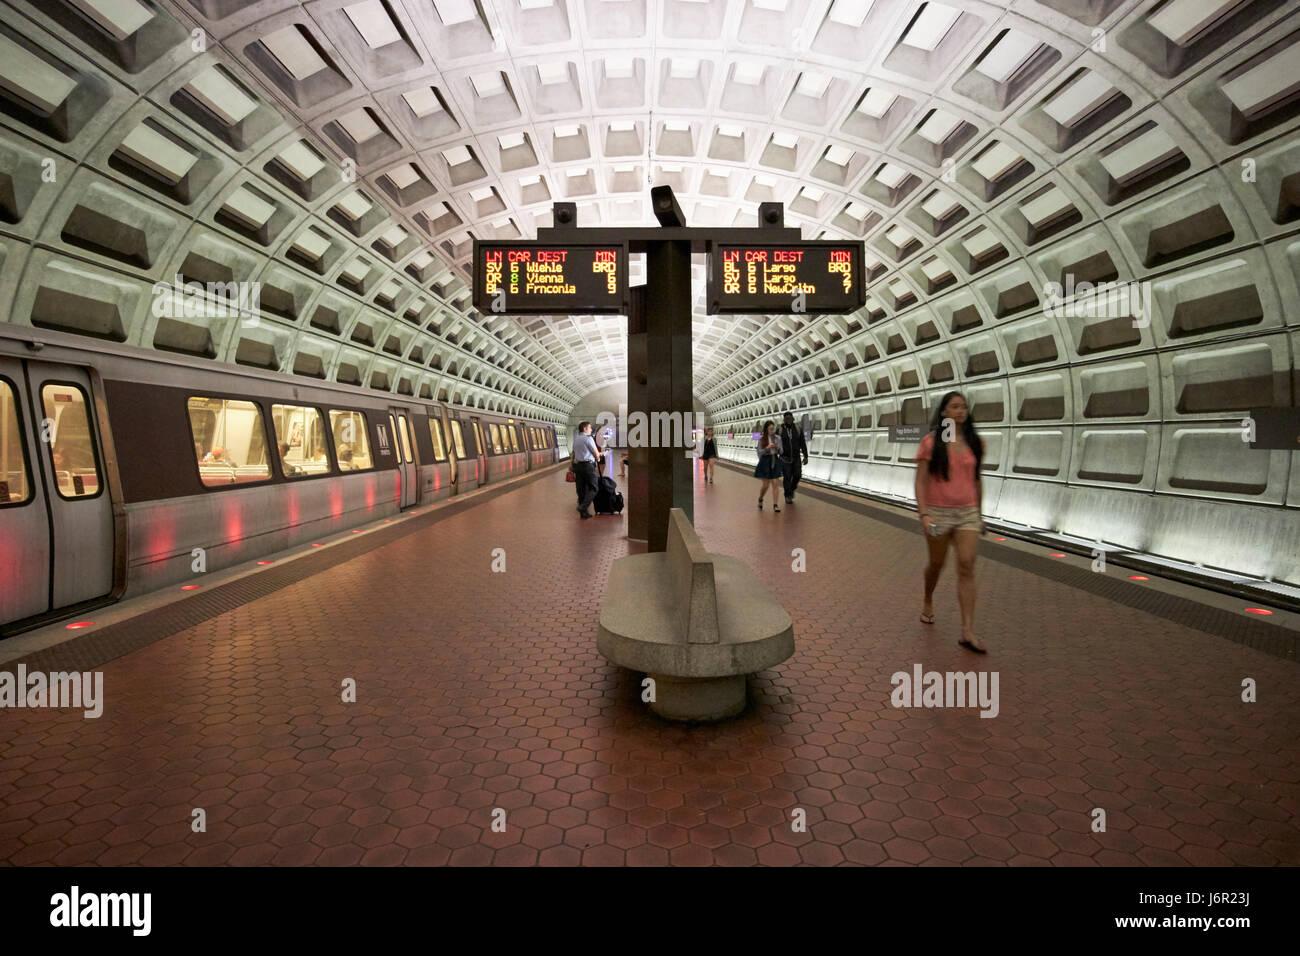 Washington dc metro foggy bottom